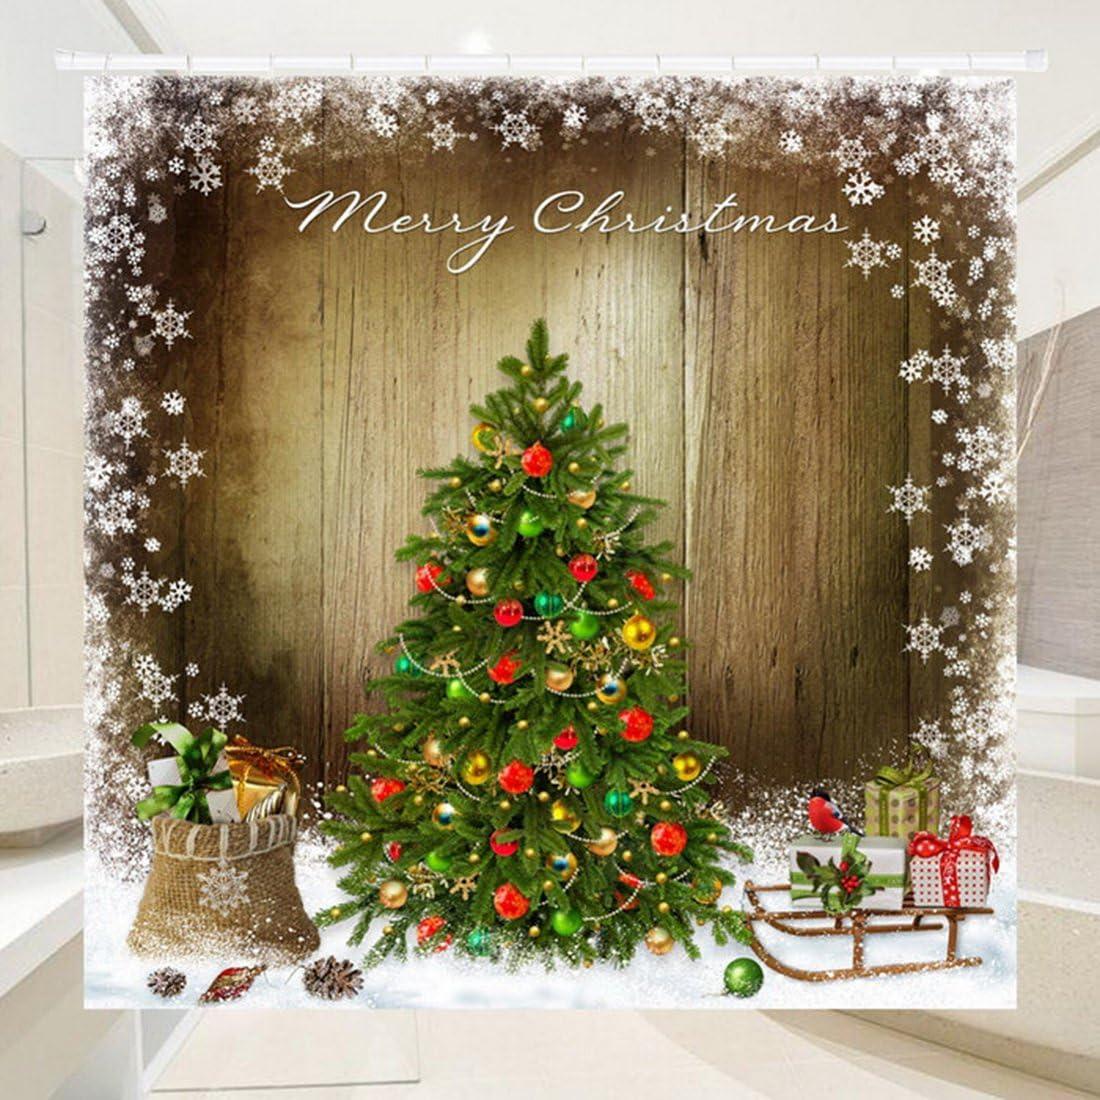 laamei Cortina de Ducha Impermeable de Ba/ño 3D Digital Impresi/ón Cortinas de Ba/ño Tema Navidad Decorativa Infantil de Poli/éster Resistente al Moho con Ganchos 180x180cm 180x200cm